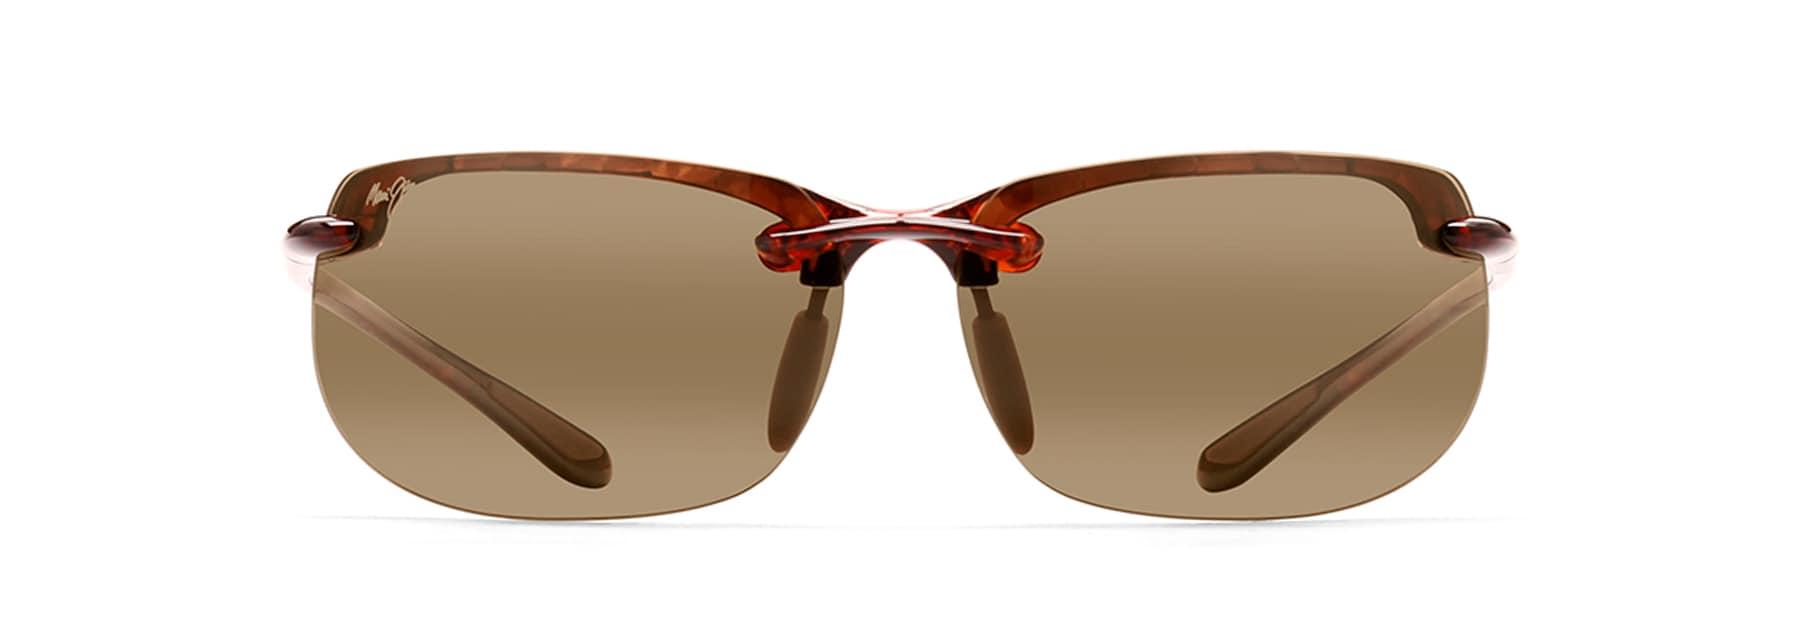 eceb53450d08 Banyans Polarised Sunglasses | Maui Jim®